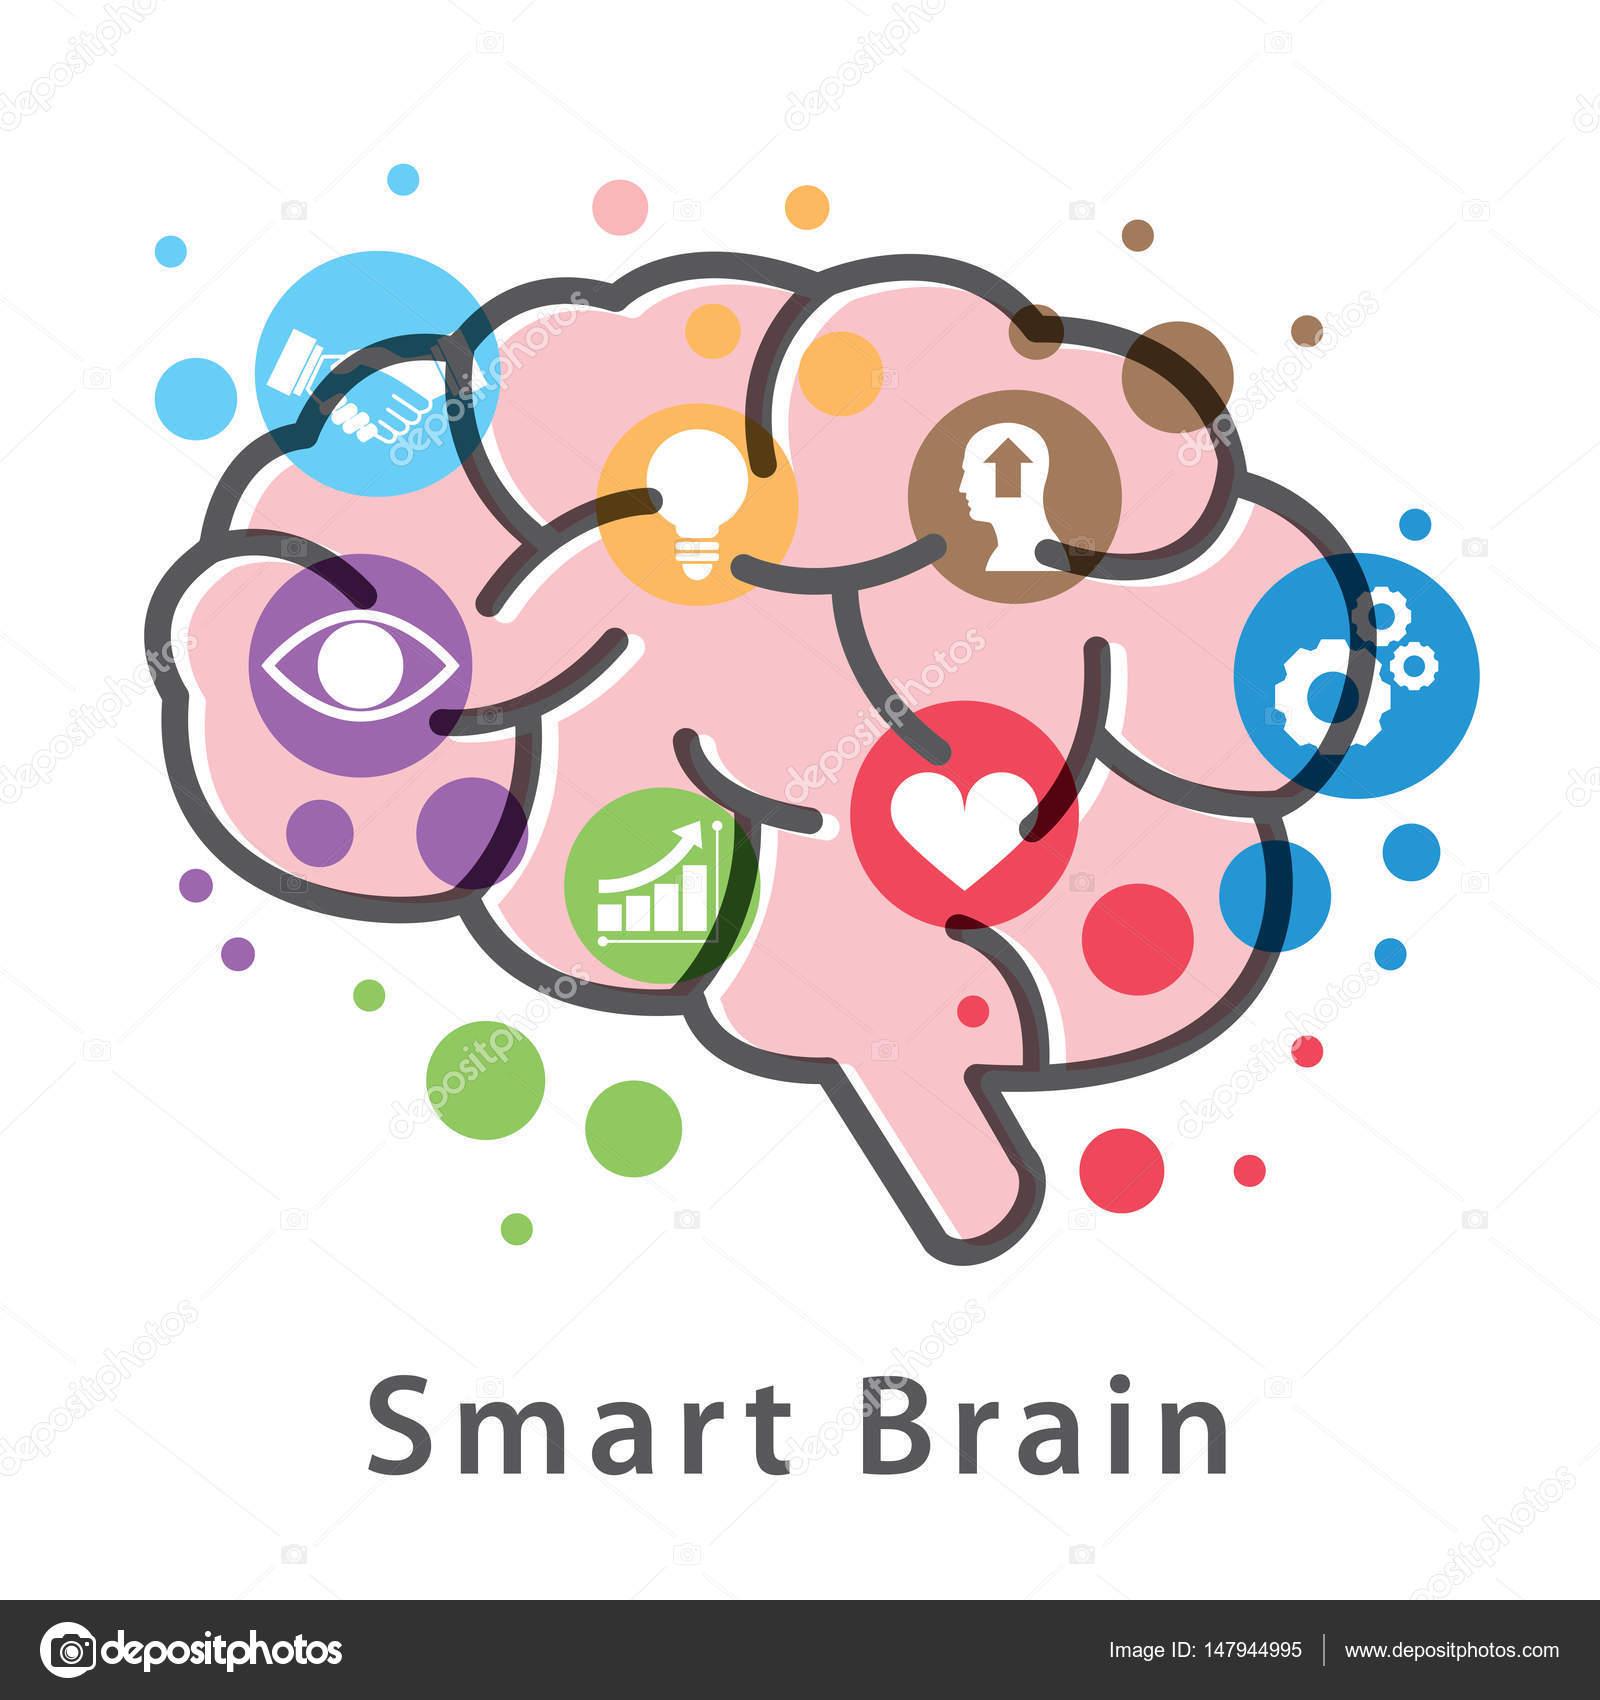 Smart brain symbol icon design stock vector pornthep 147944995 smart brain symbol icon design stock vector biocorpaavc Images